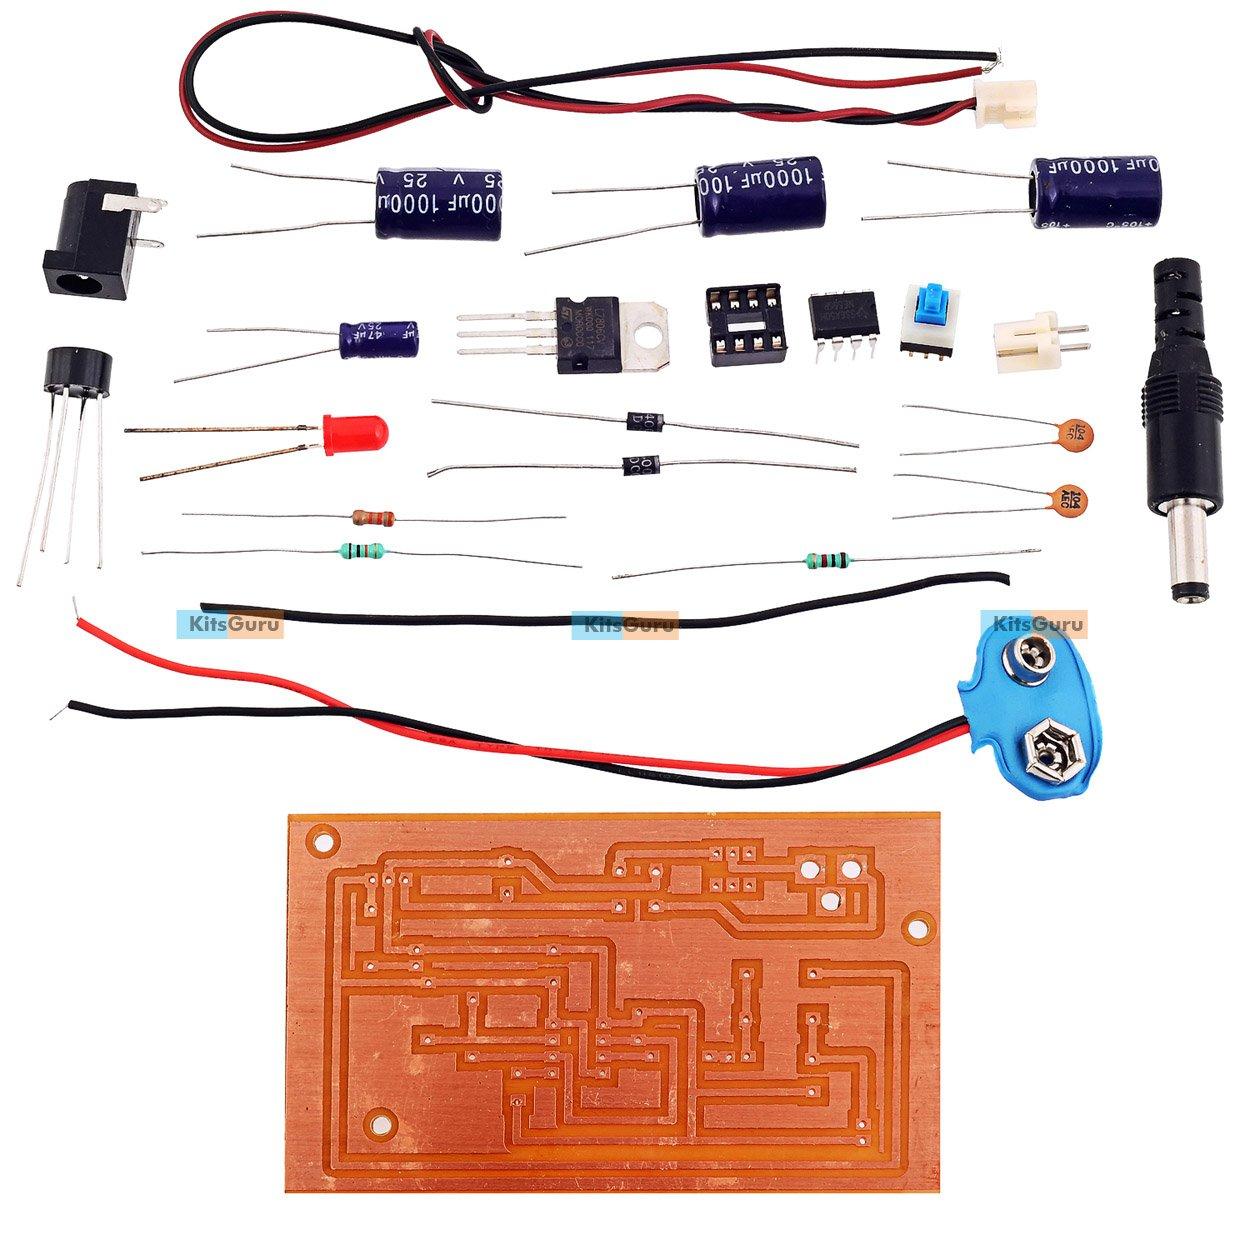 Kitsguru Voltage Doubler Mini Projects Diy Kit Multicolour Amazon With Ic 555